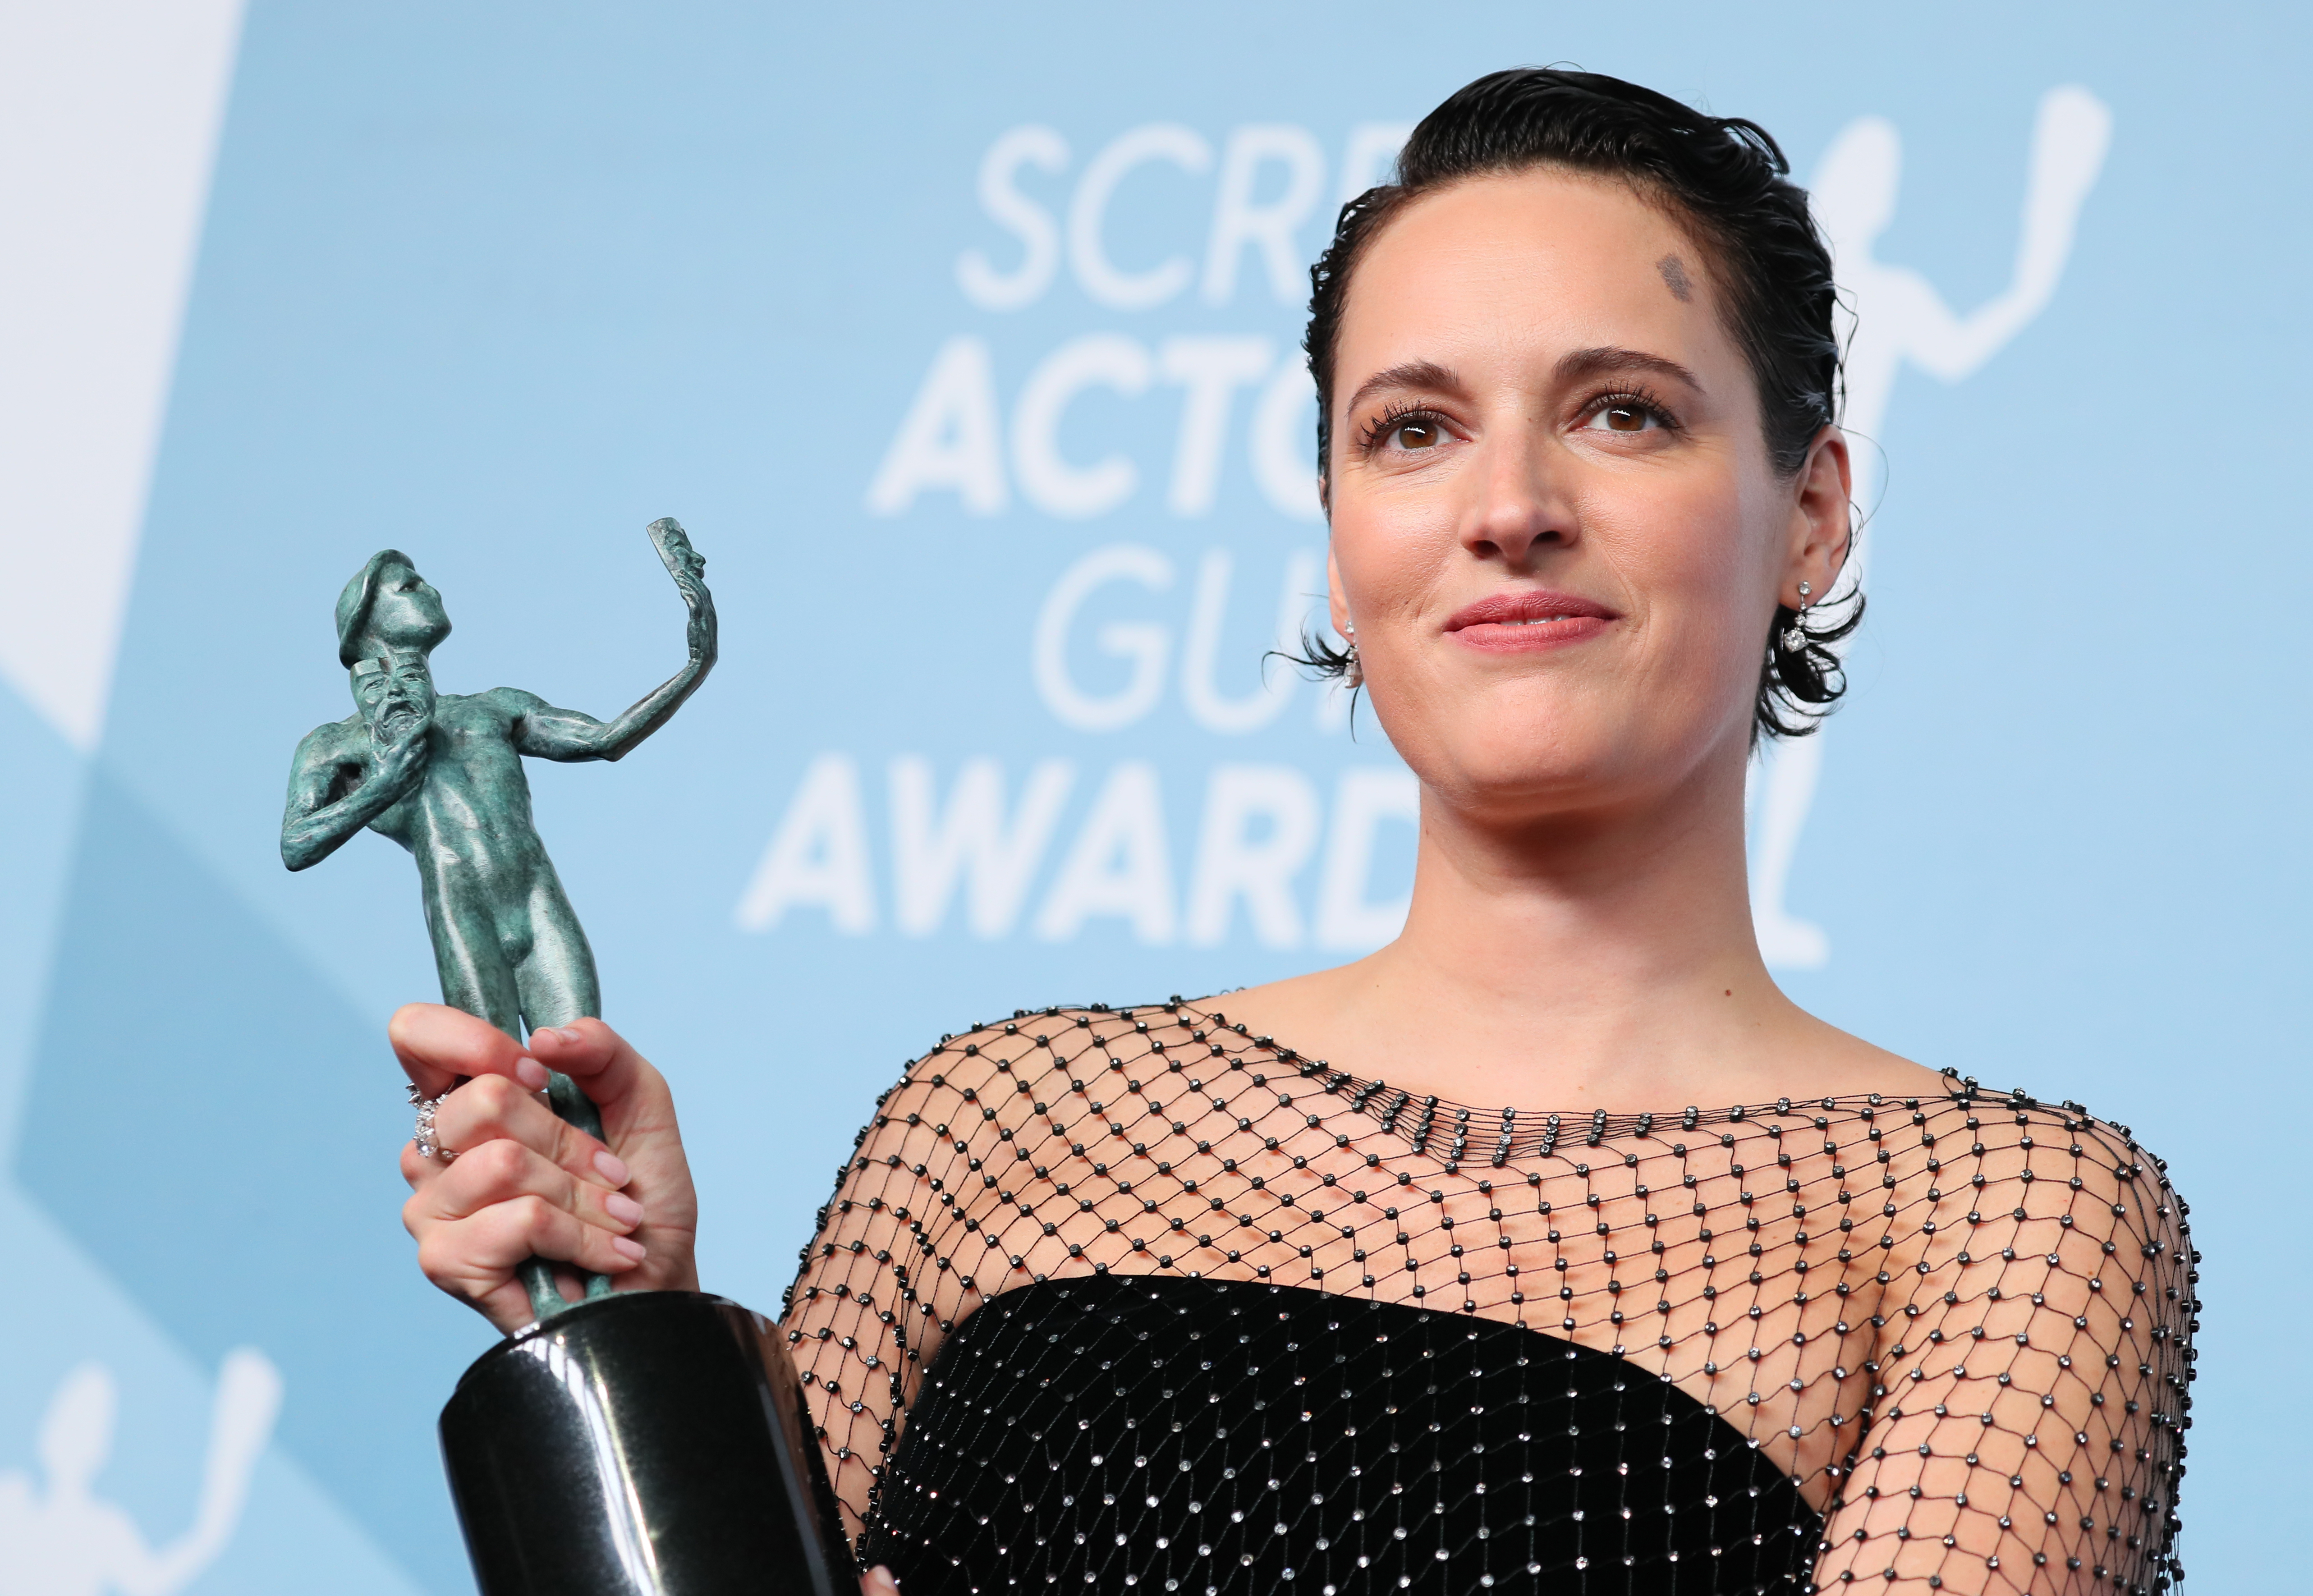 US - ENTERTAINMENT - SAG - FILM - AWARDS - PRESSROOM No Time To Die